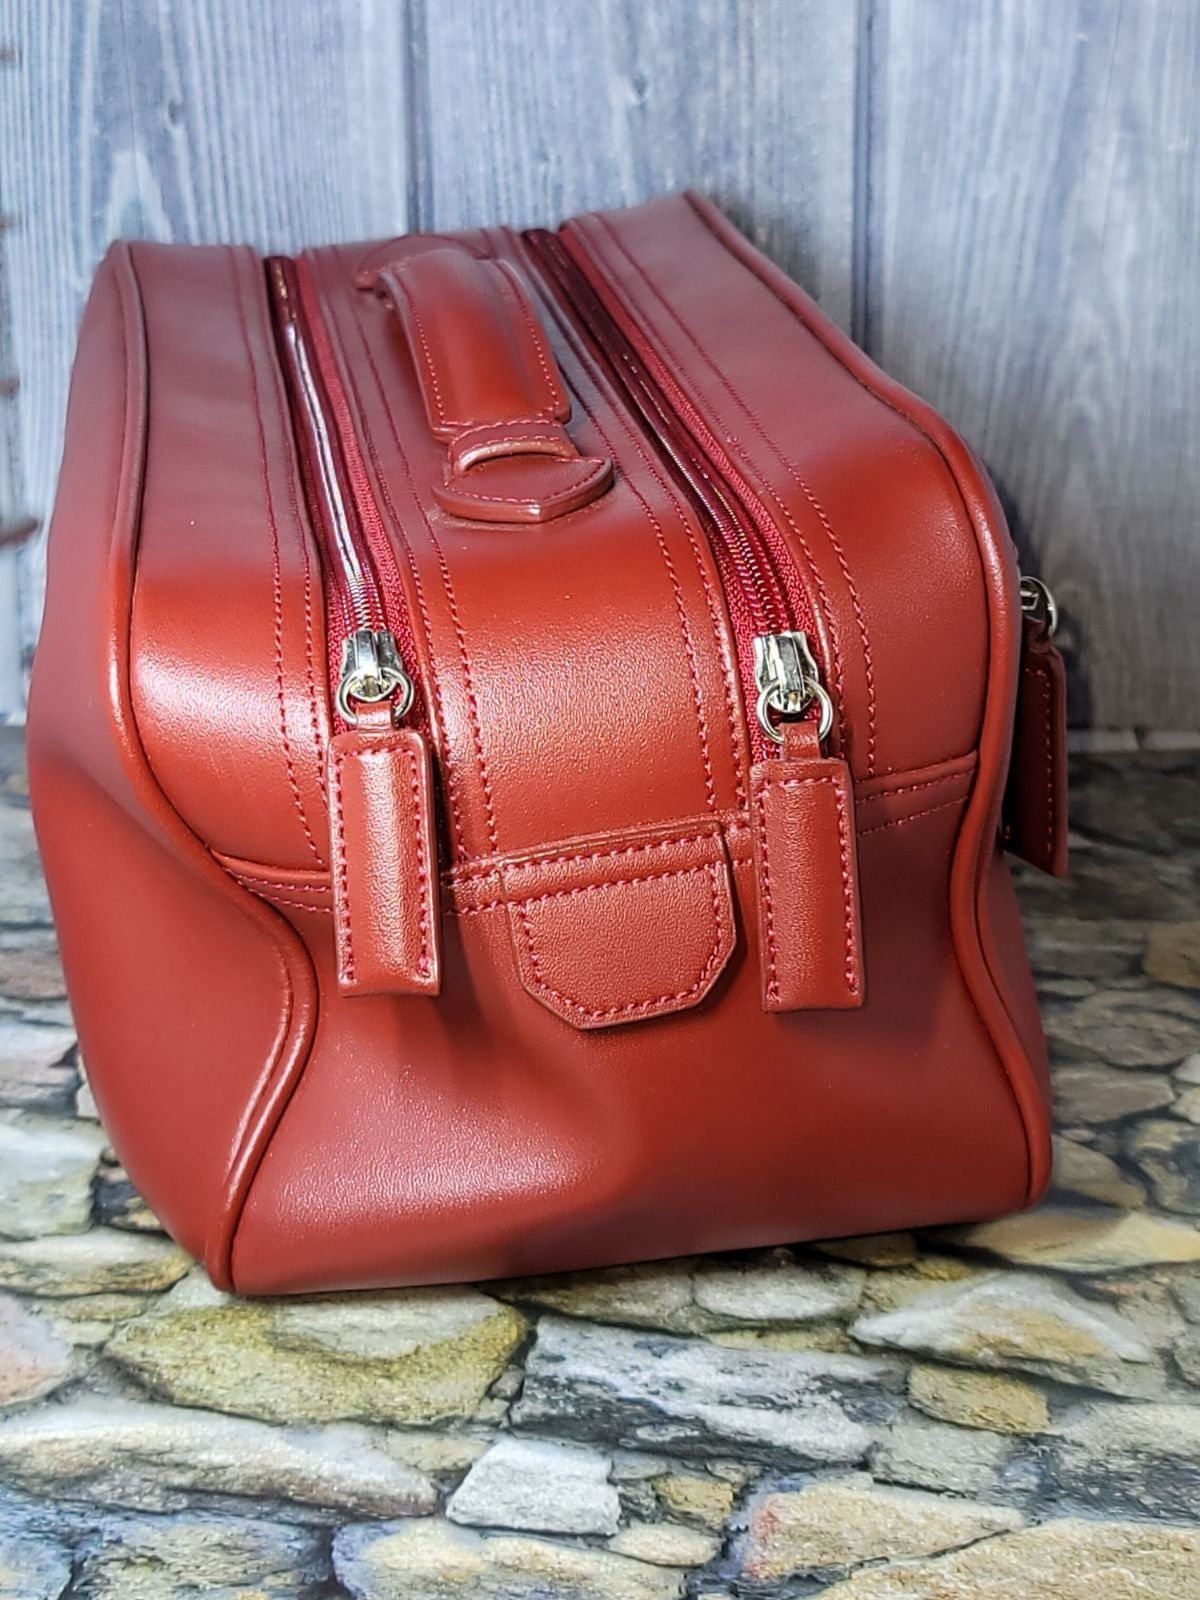 Anne Klein cosmetic train bag red